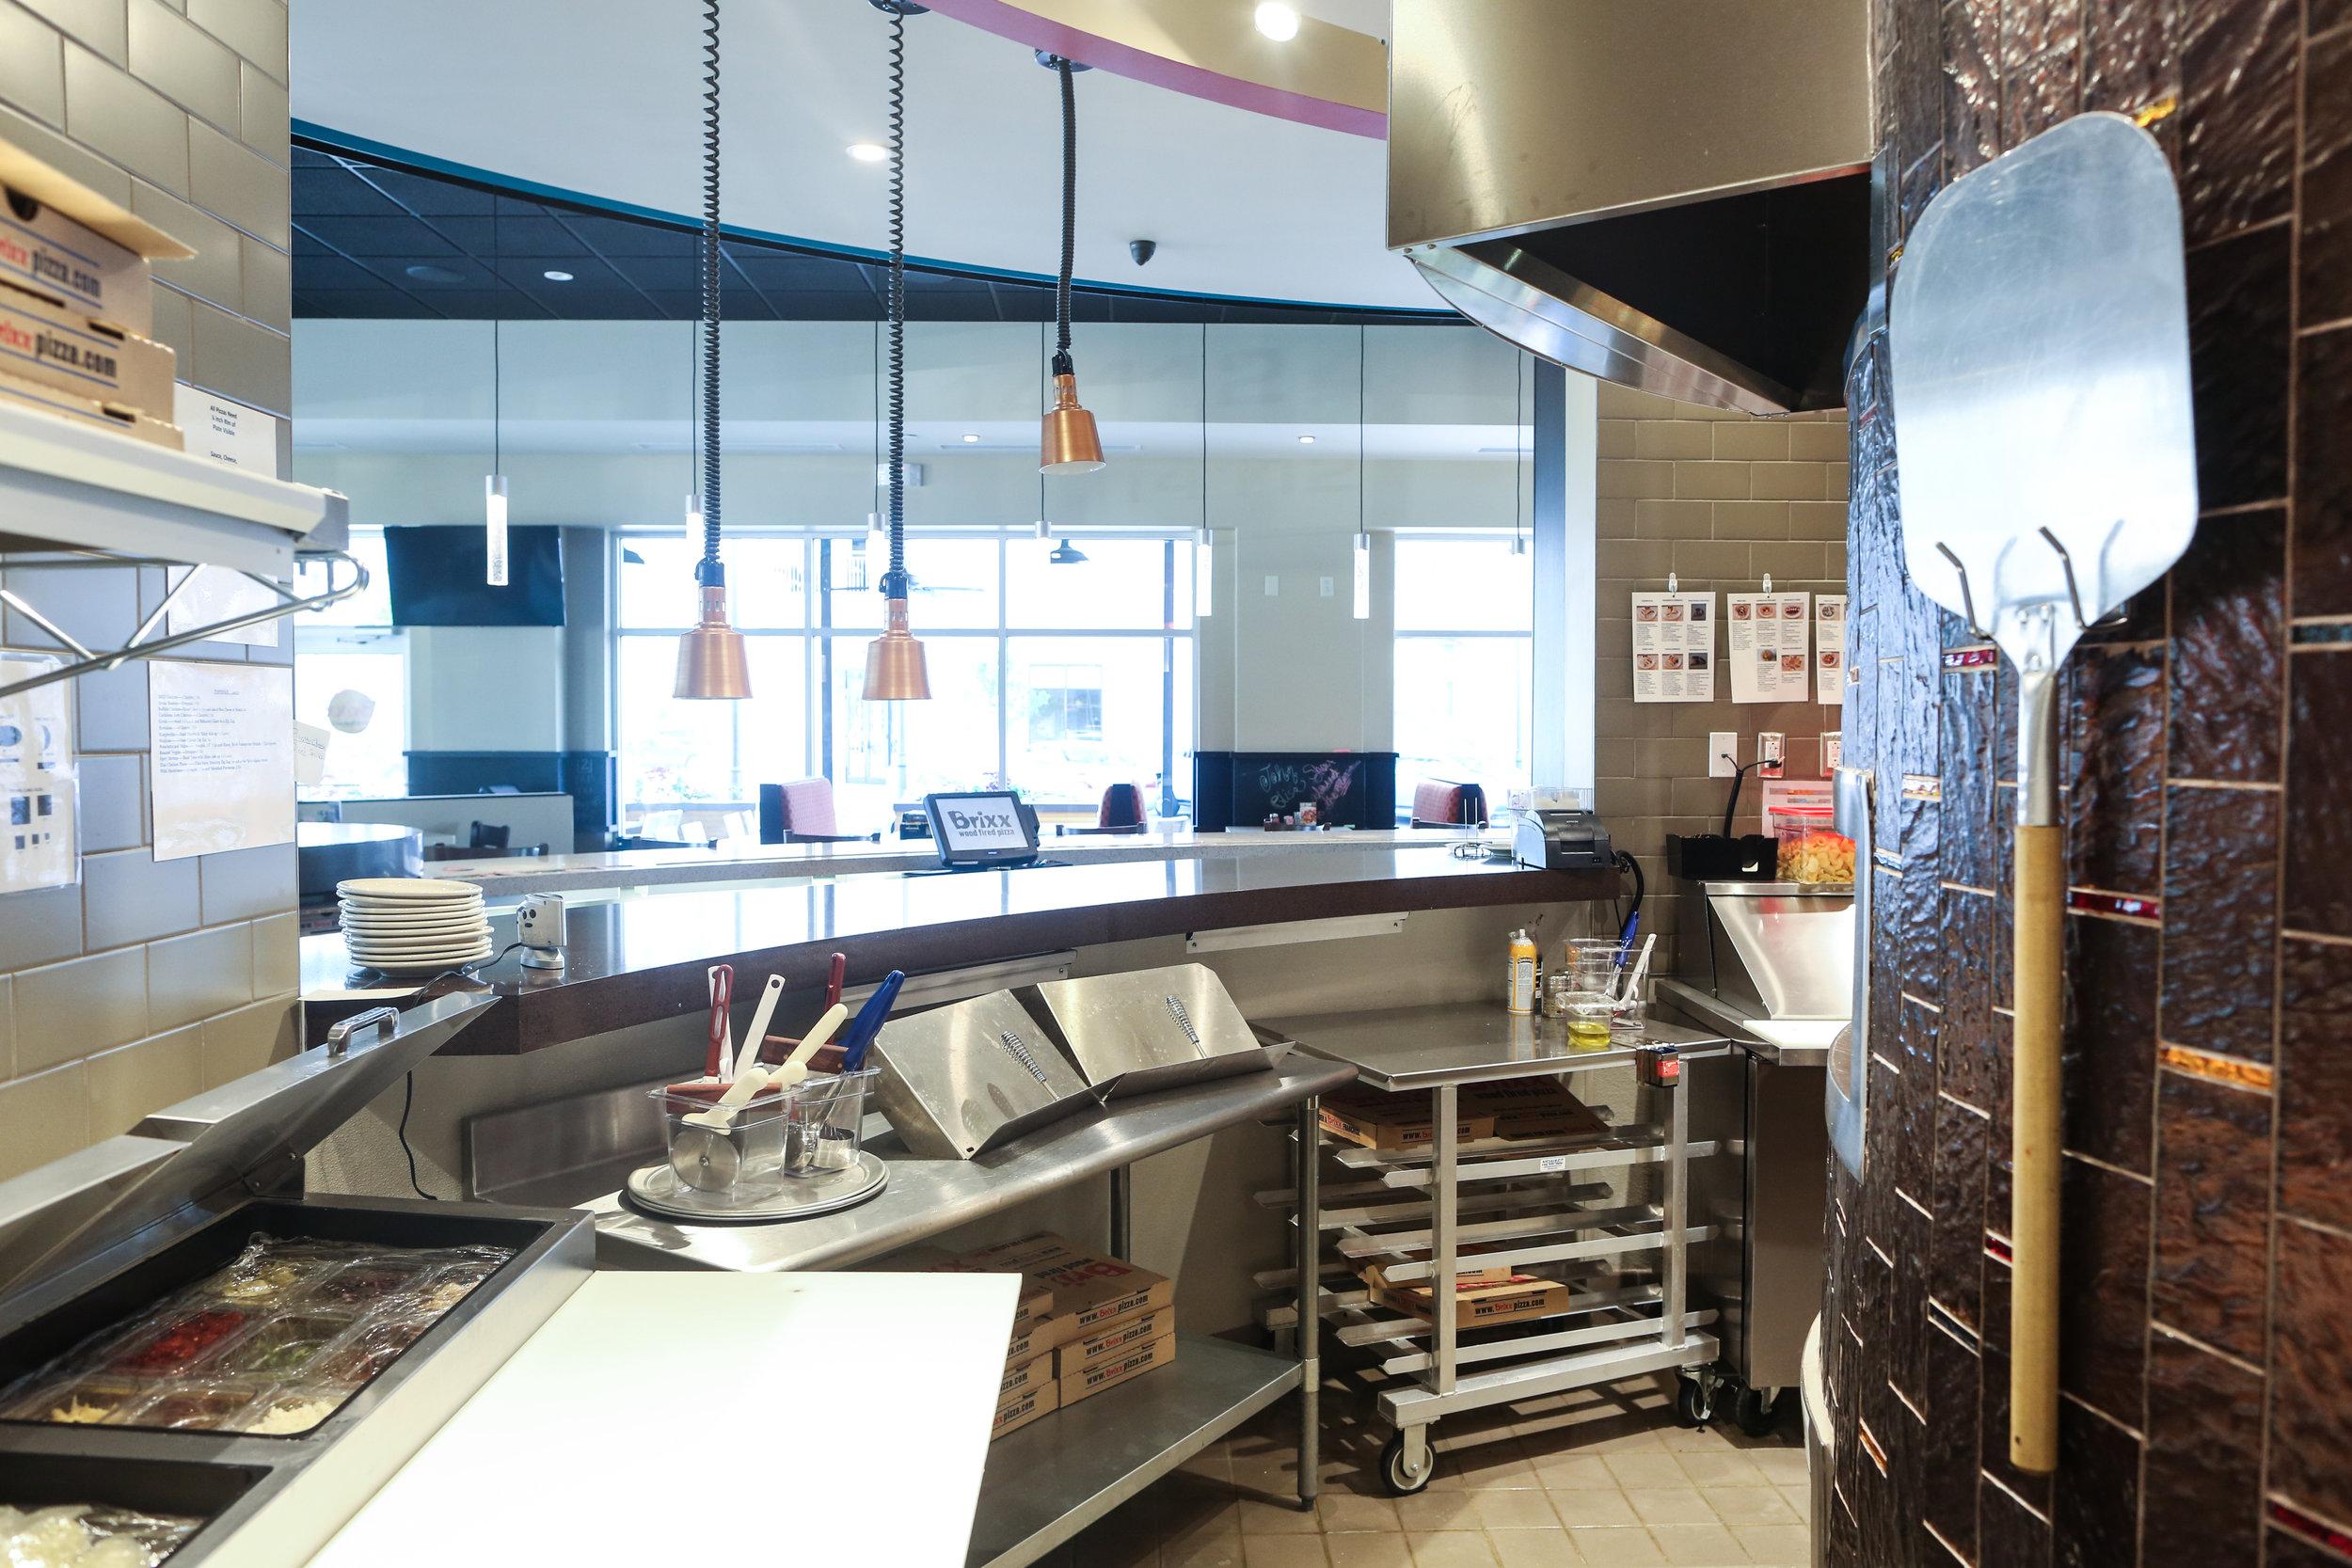 ADW-Restaurant-Brixx-Wood-Fired-Pizza-Cary-NC-Kitchen.JPG